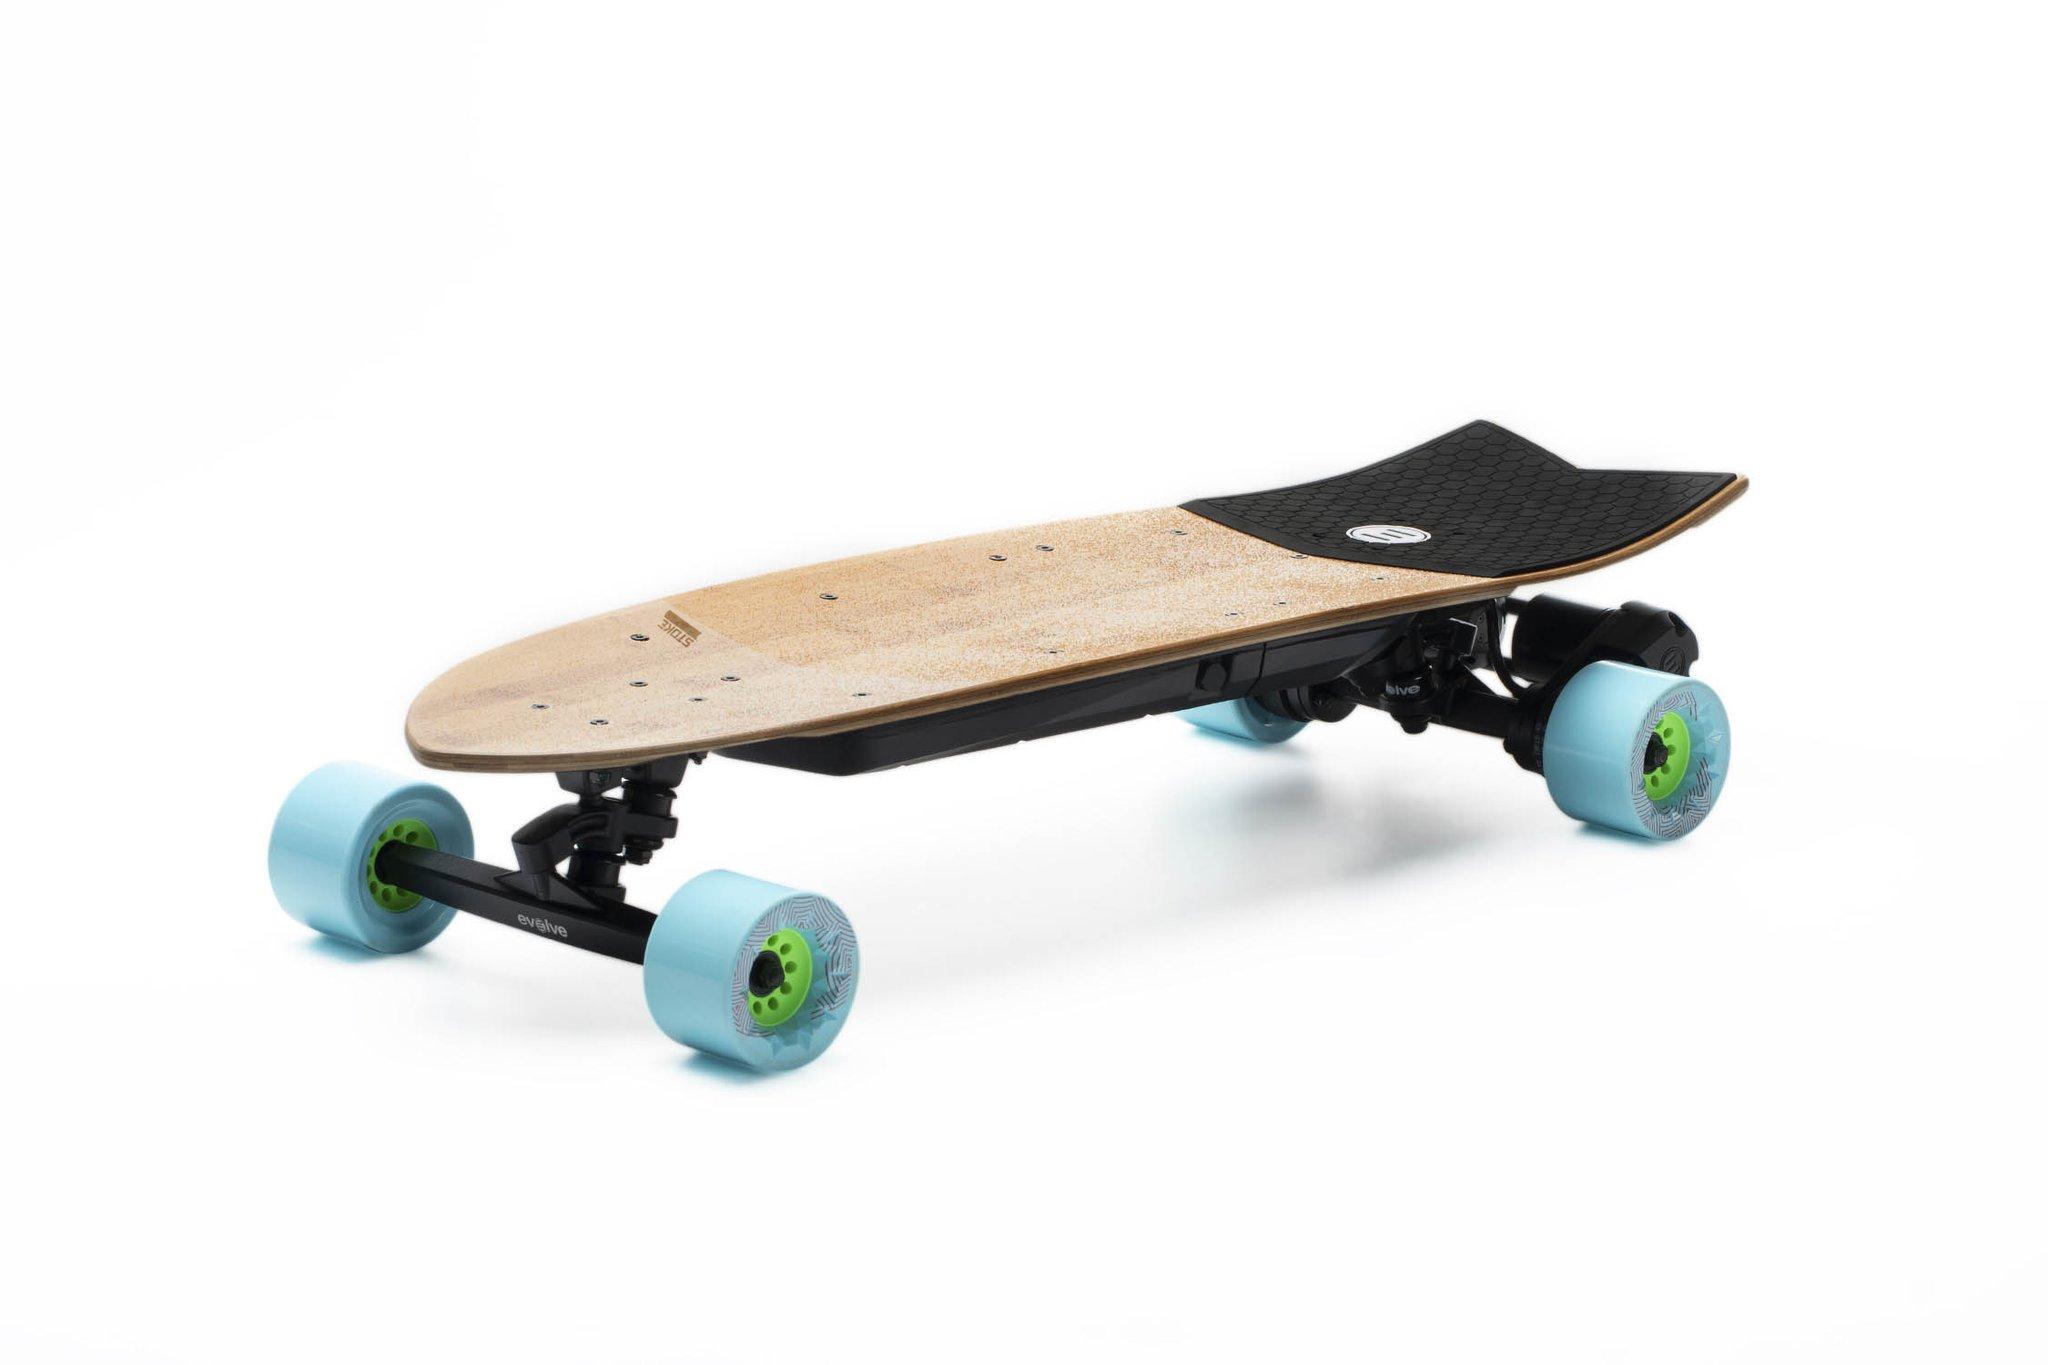 evolve electric skateboards blue wheels